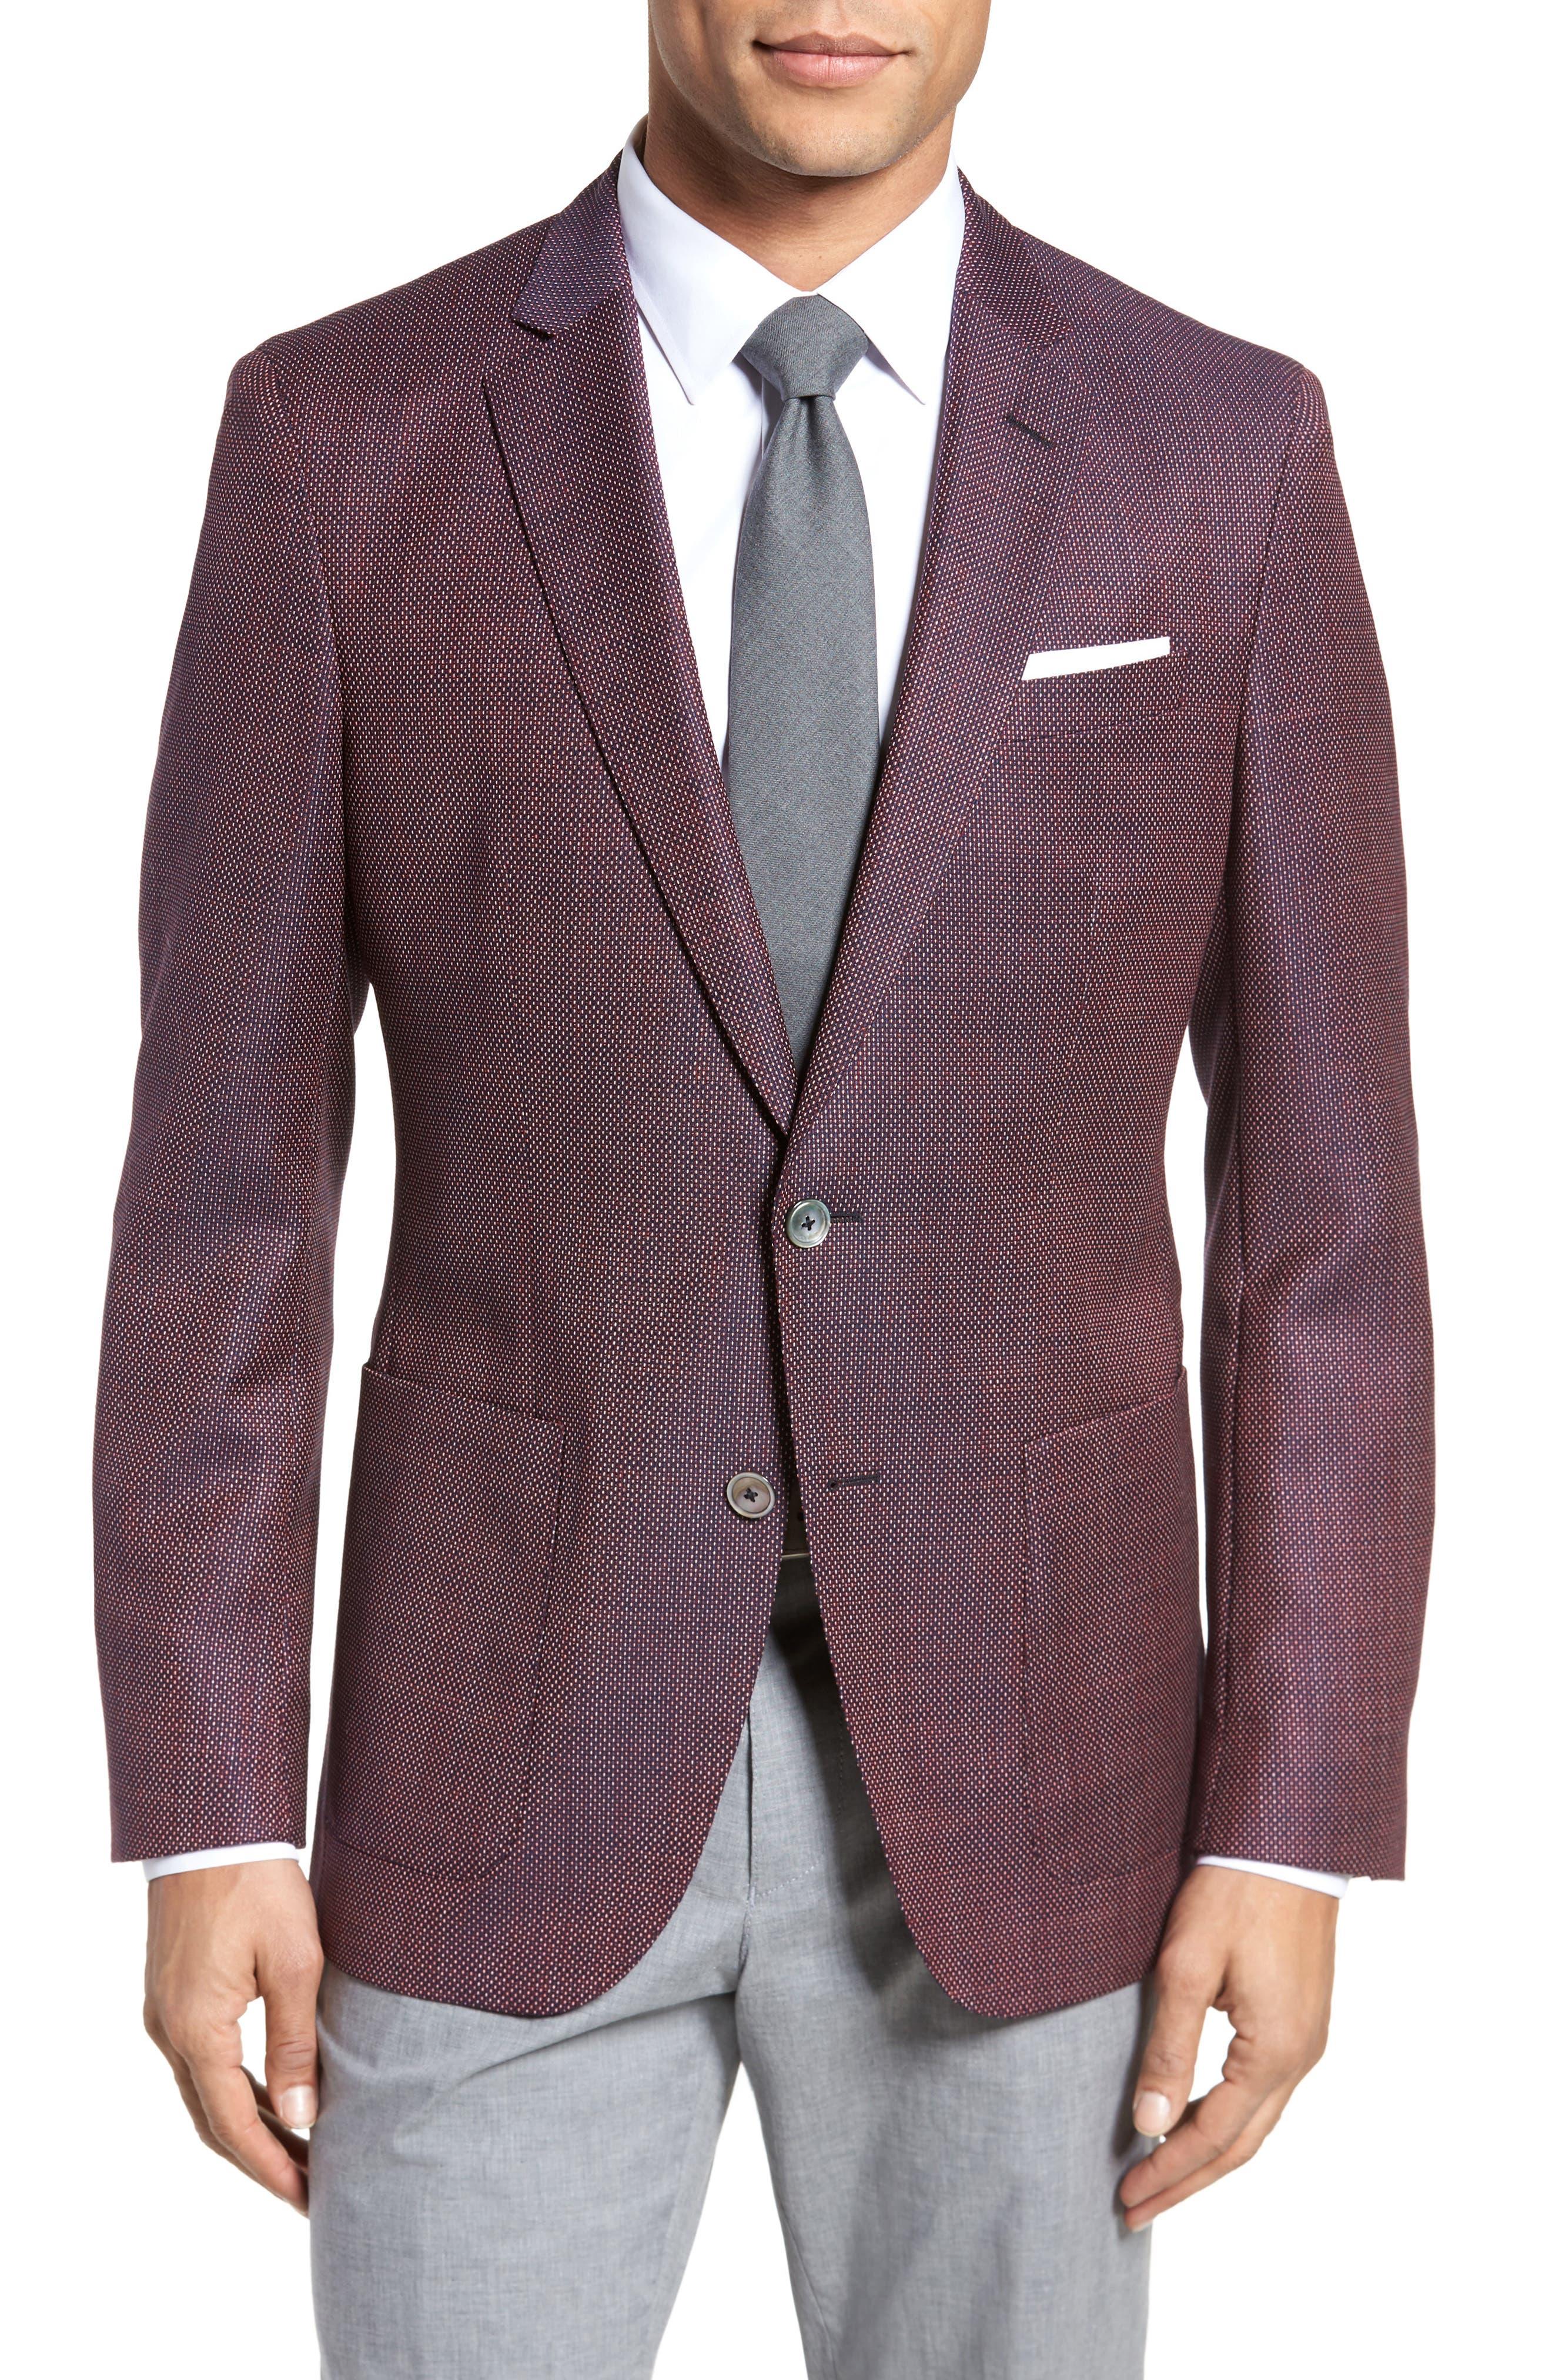 Henten Trim Fit Wool Blazer,                         Main,                         color, 600